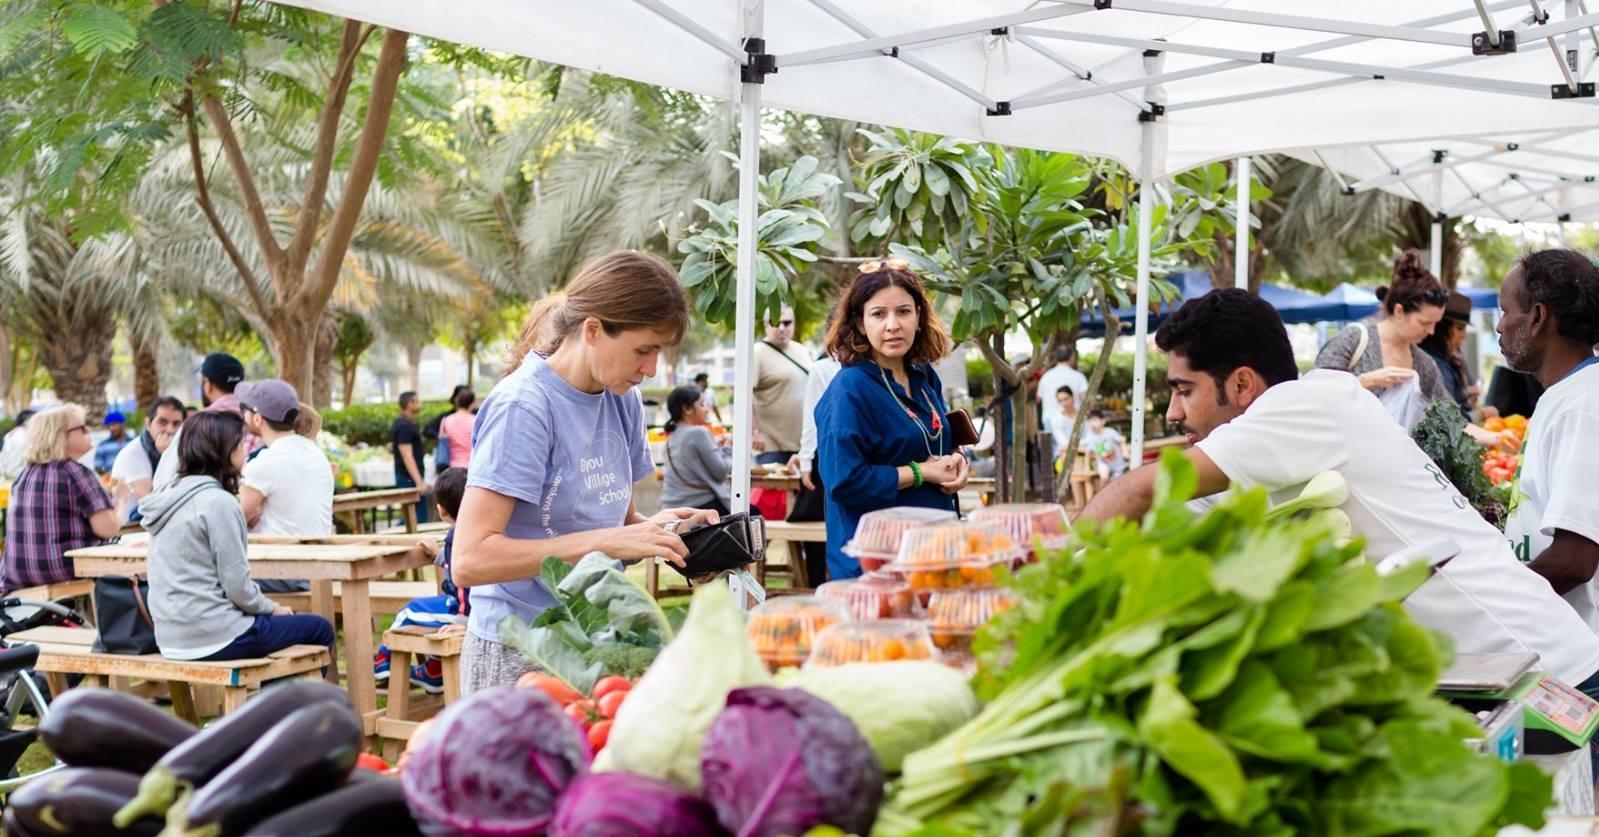 Markets in Dubai - Farmers Market